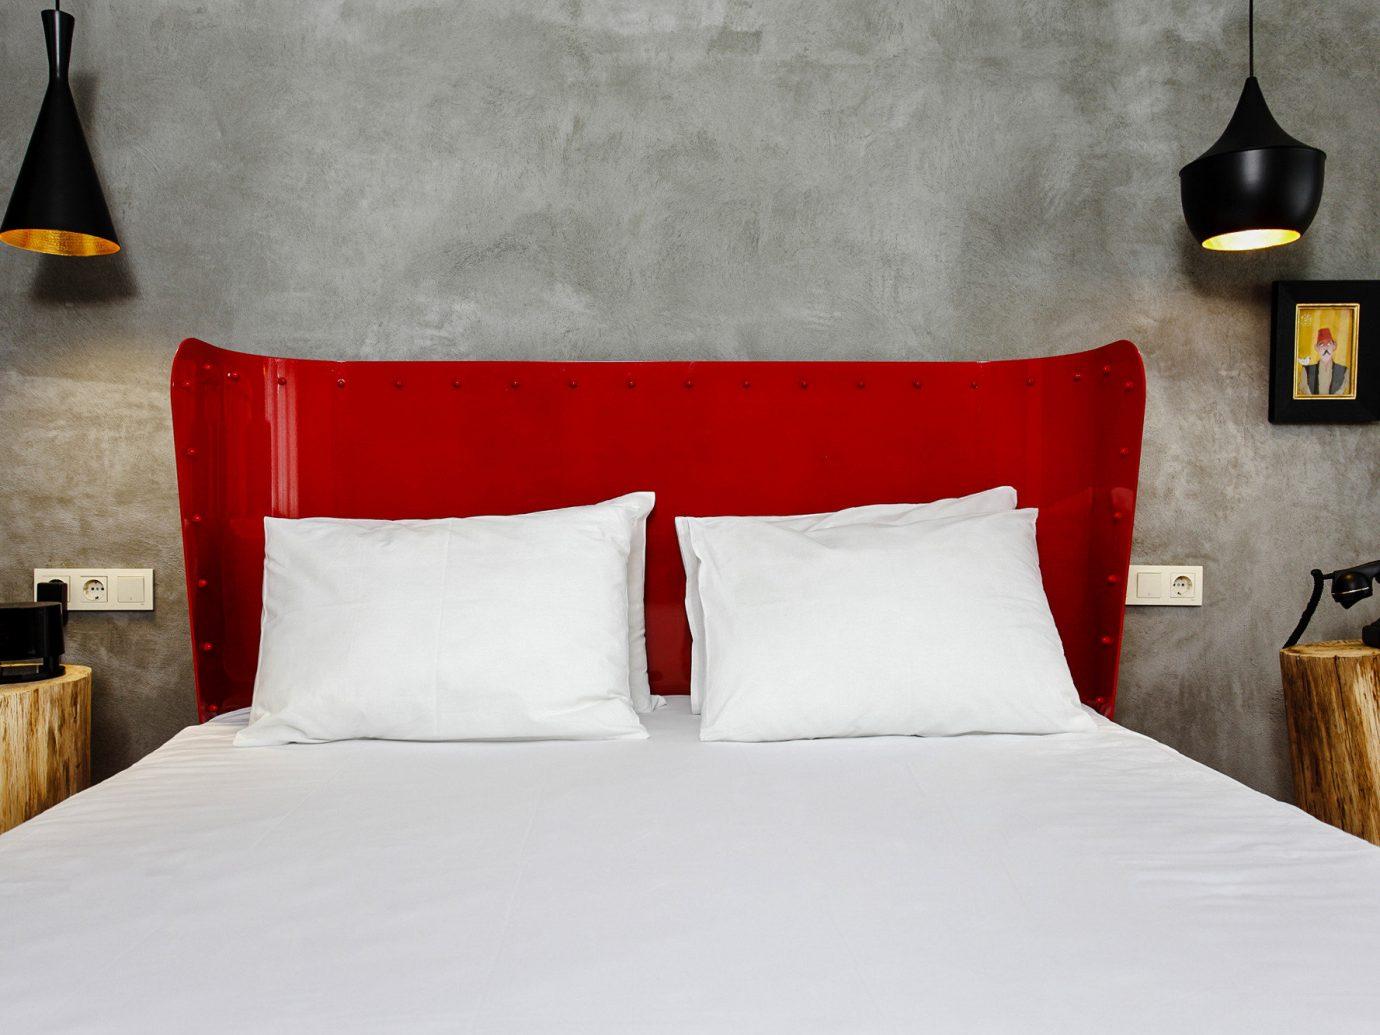 Boutique Hotels Hotels Luxury Travel bed indoor wall red hotel room bed frame bed sheet Suite interior design Bedroom pillow home textile floor furniture duvet cover comfort mattress bedding